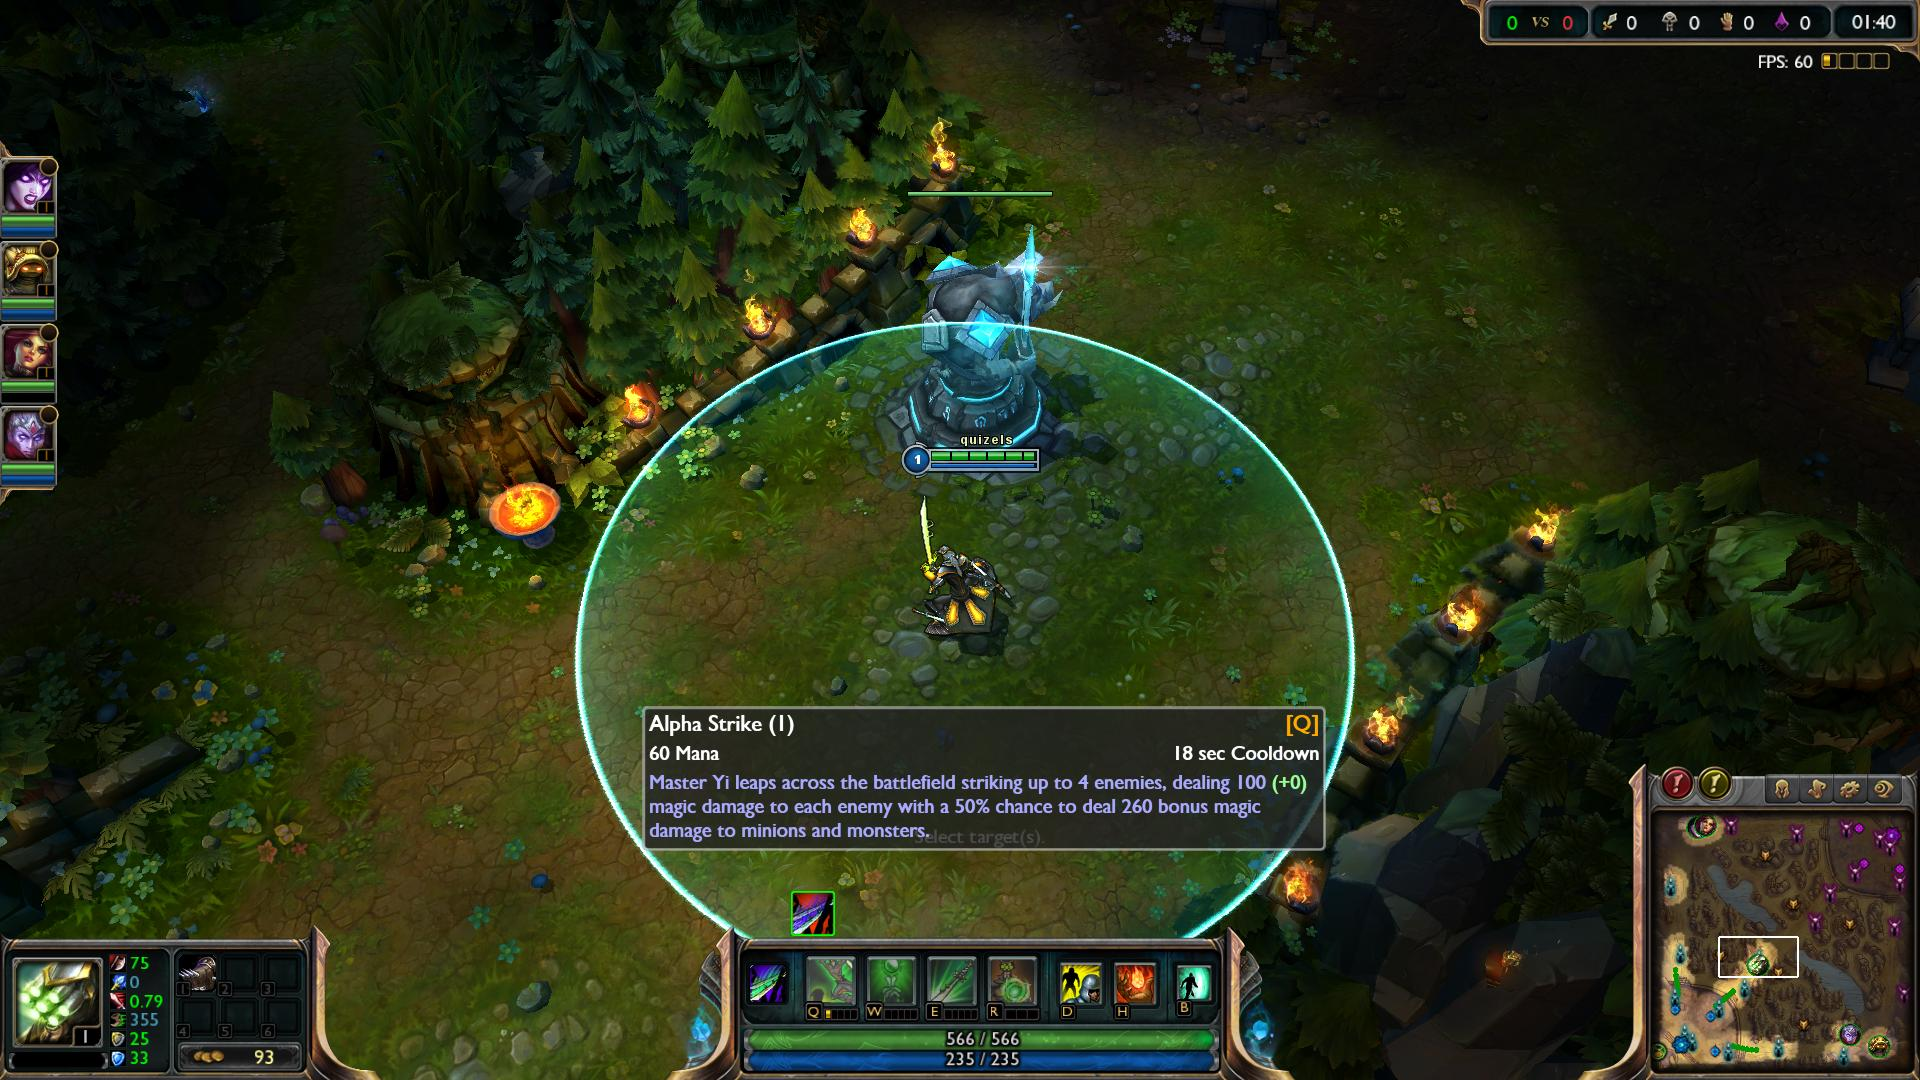 Alpha Strike Master Yi lol lol screenshot